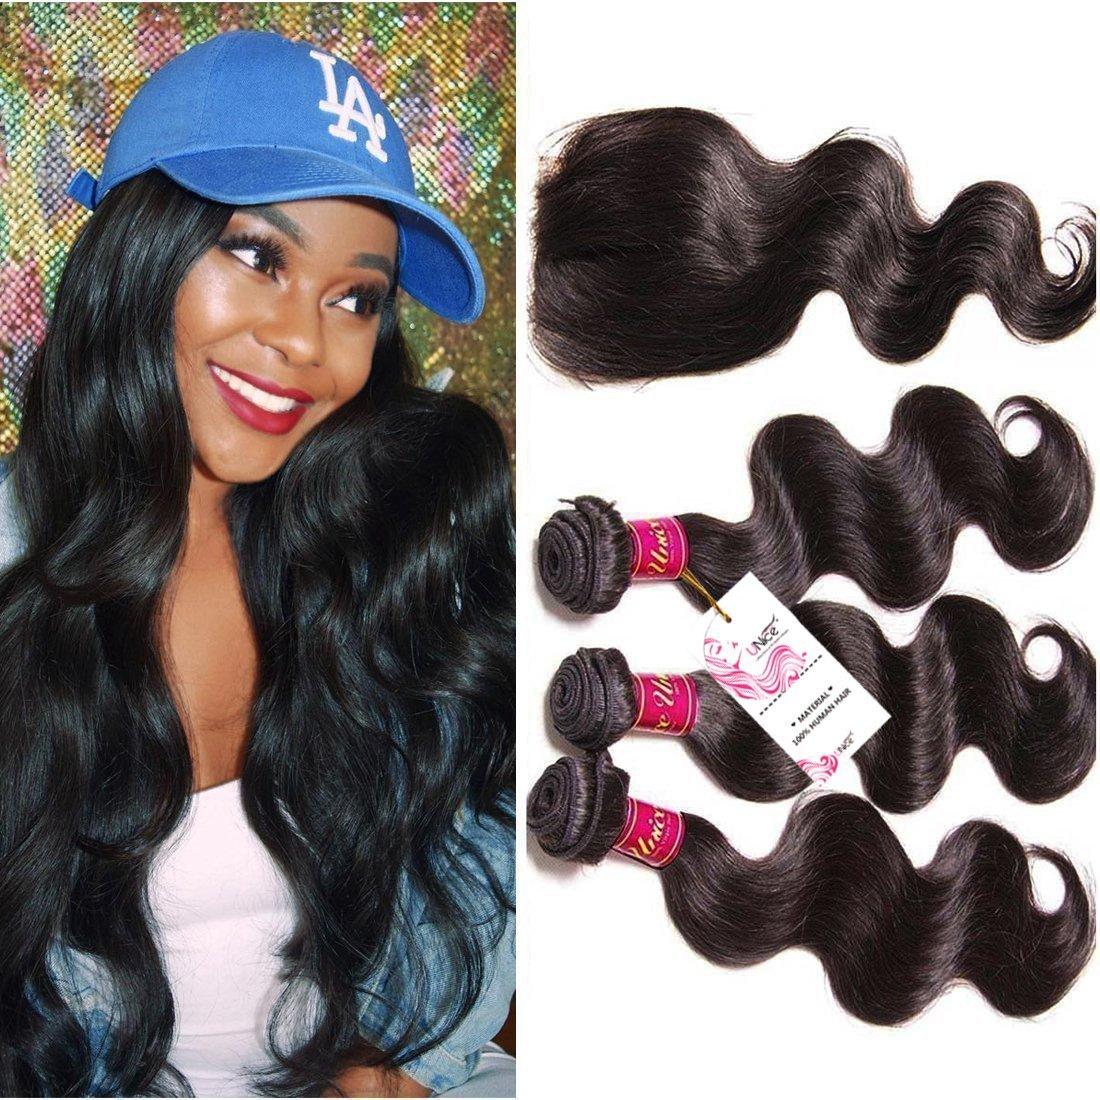 Unice Hair 4 x 4 Lace Closure with Virgin Brazilian Human Hair 3 Bundles Weaves 4 Piece  Natural Color (16 / 18 20+ / 14)